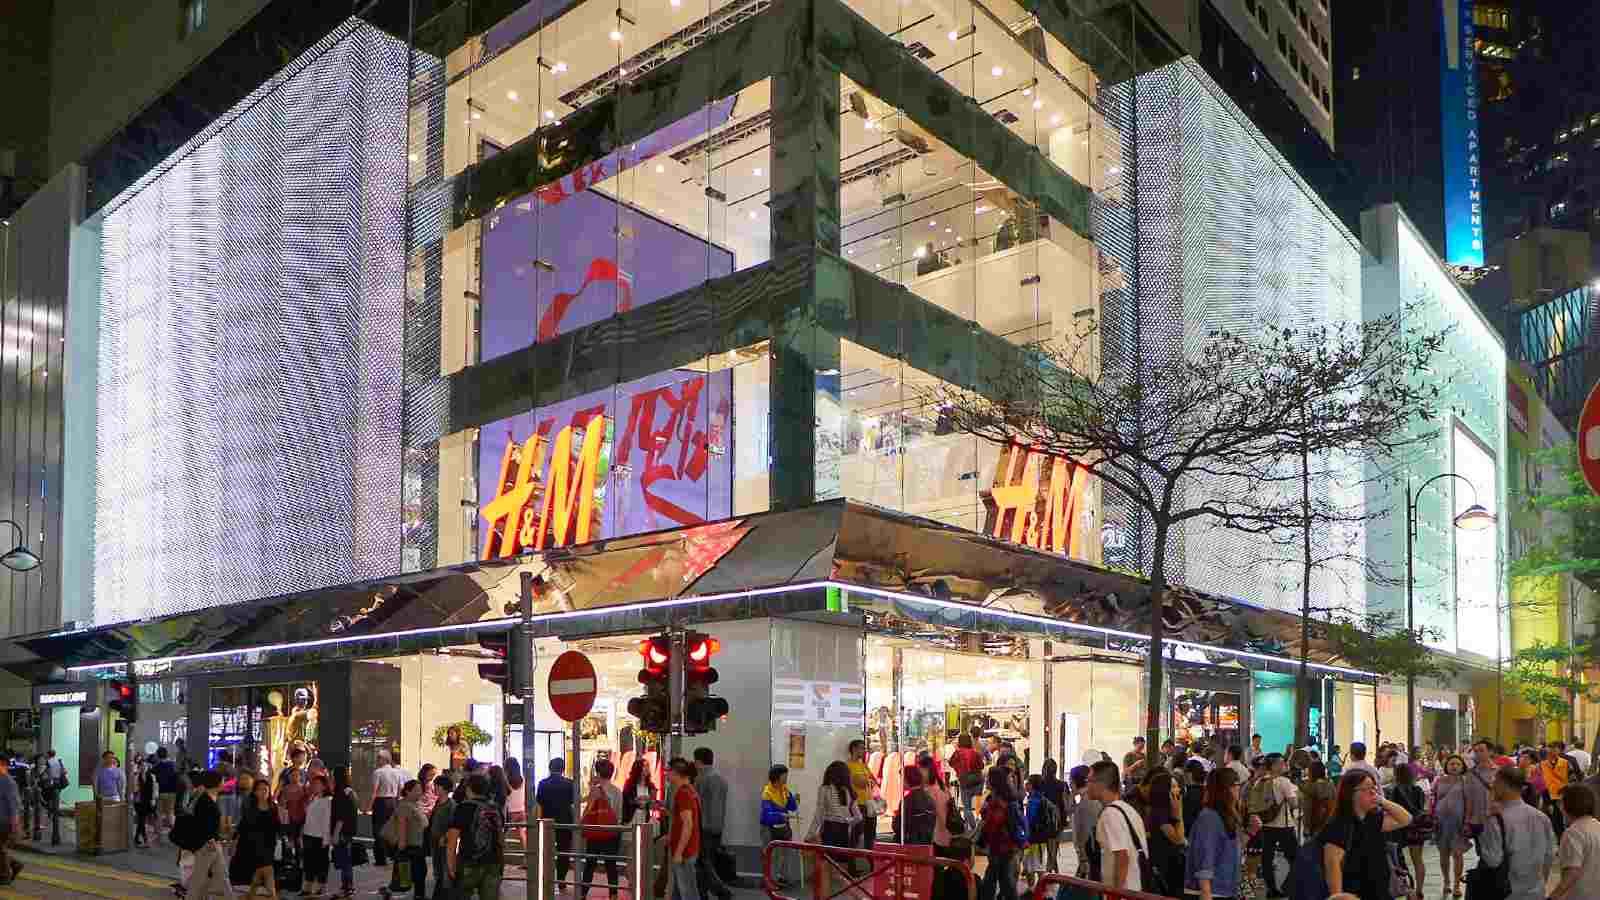 Photo: H&M Flagship store in Causeway Bay, Hong Kong. Credit: Wikimedia Commons